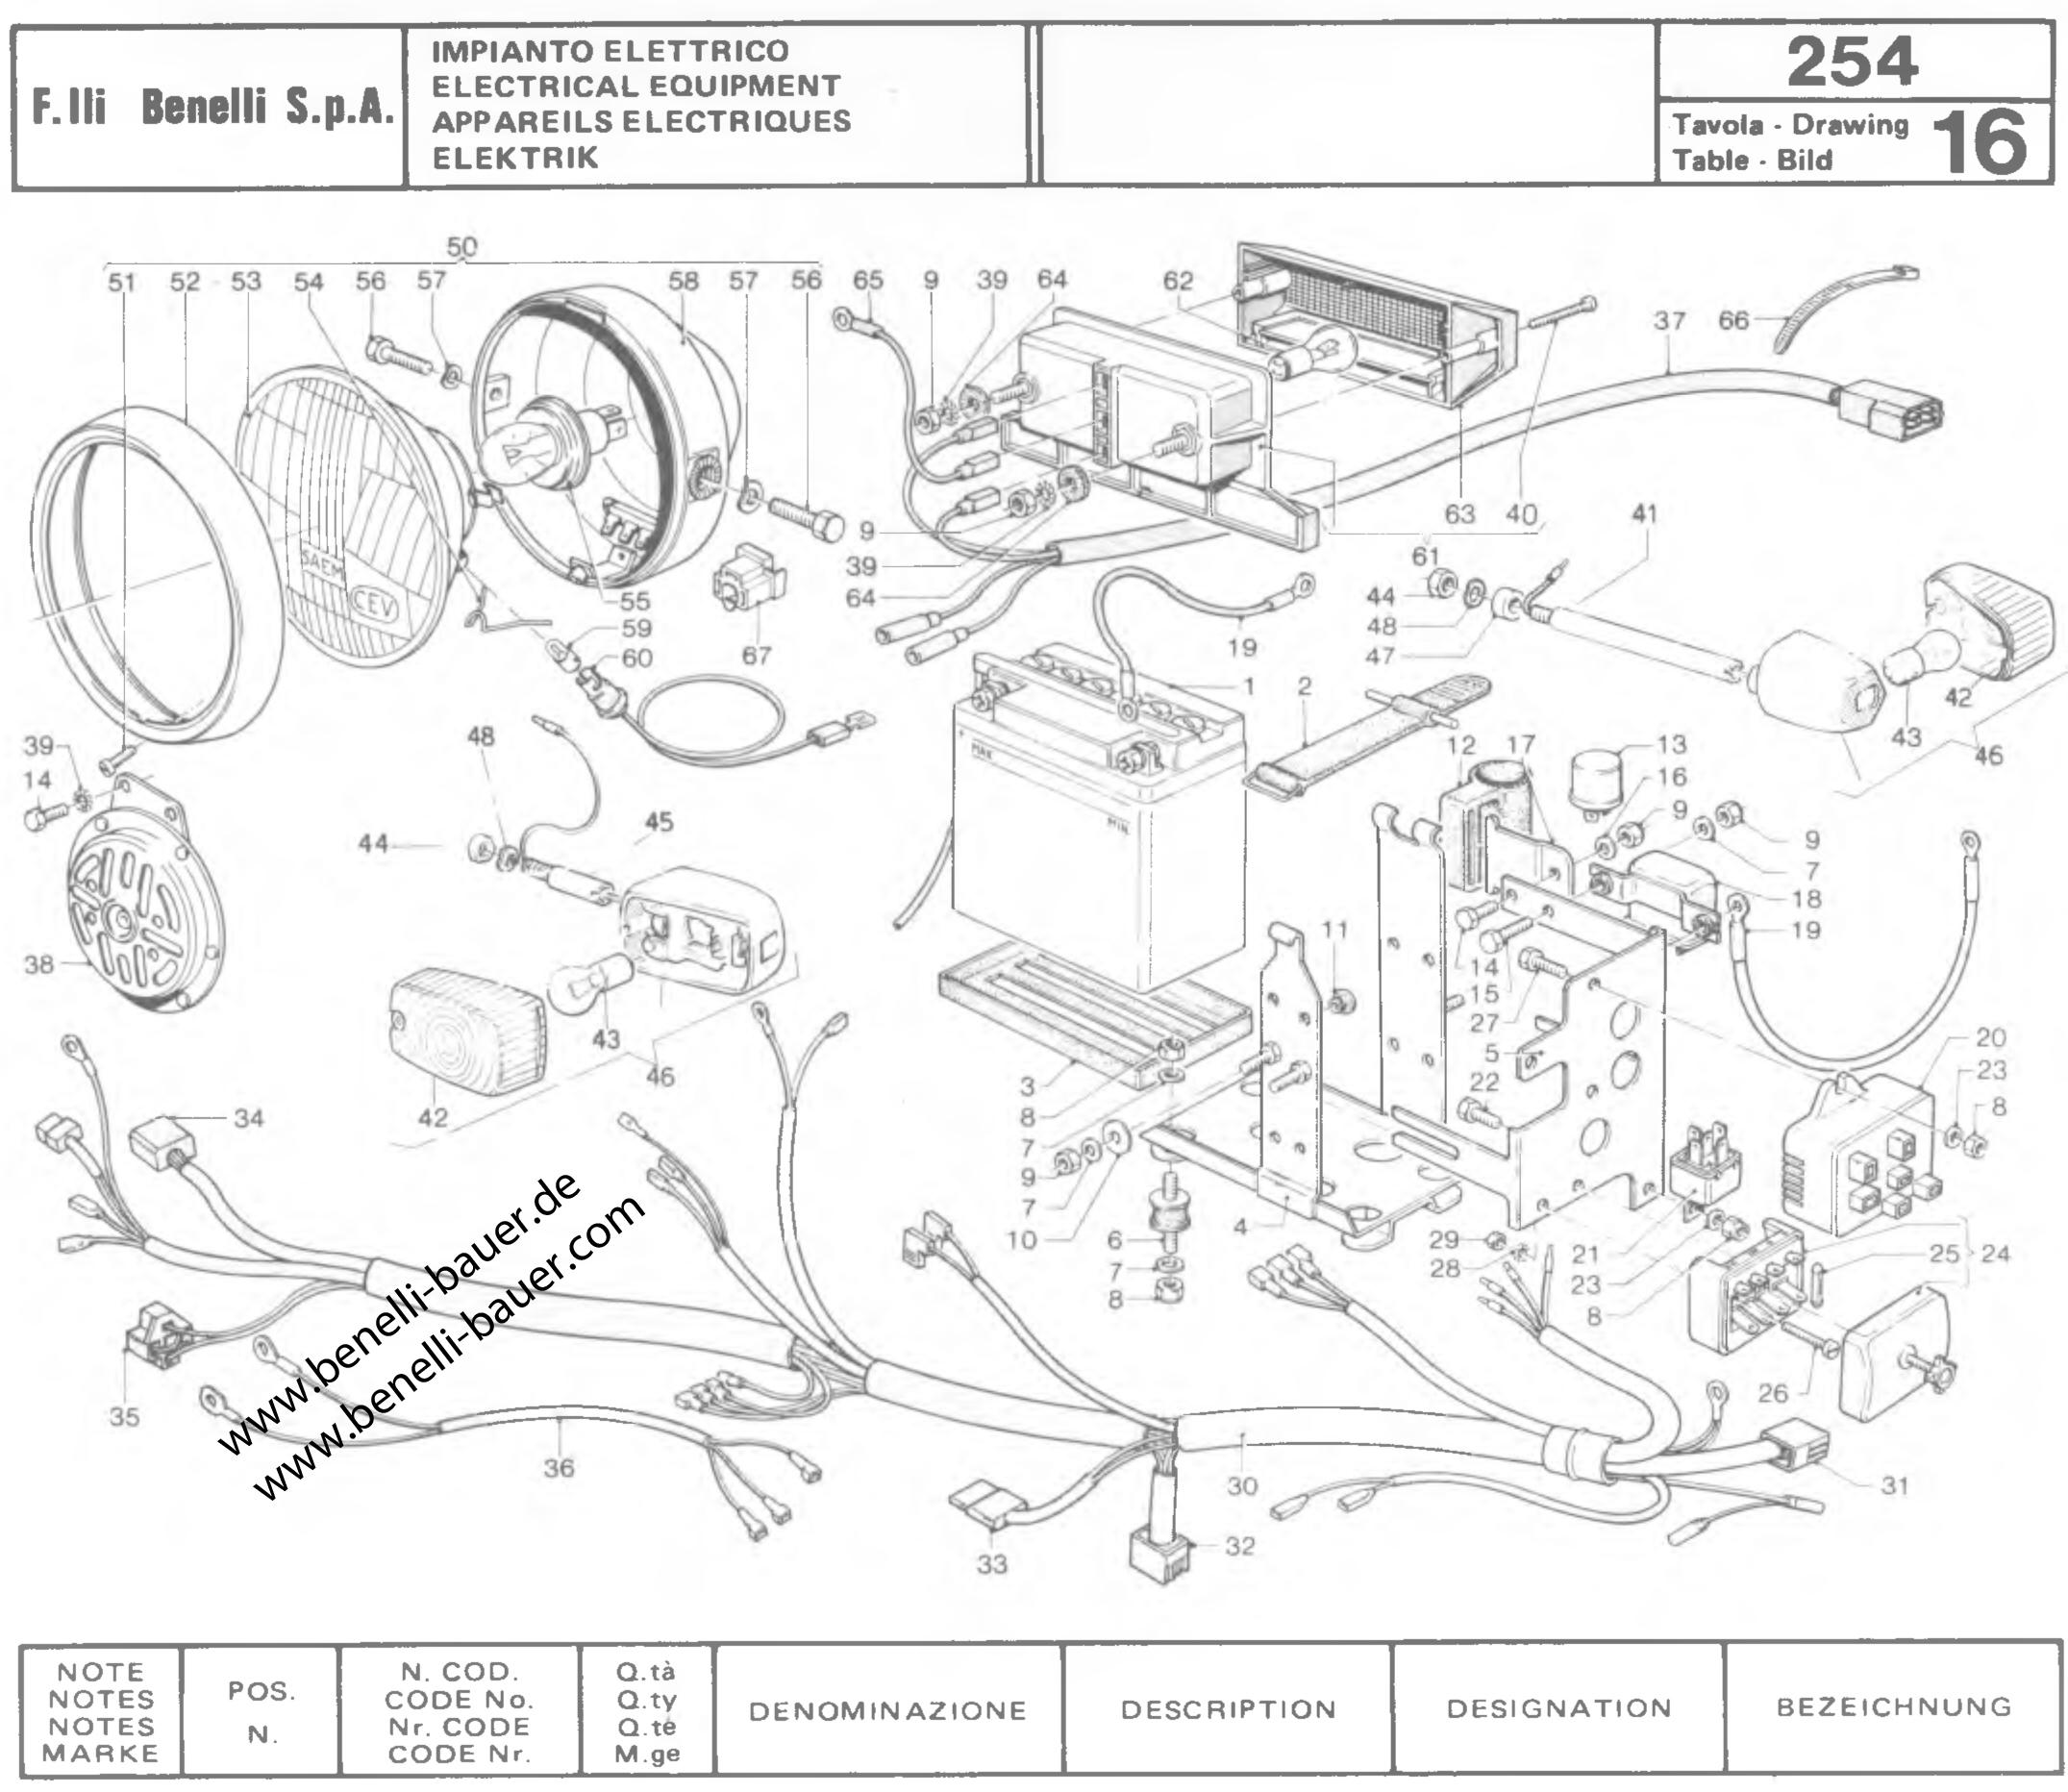 Schema Elettrico City 250 : 16 electrical equipment benelli bauer.com